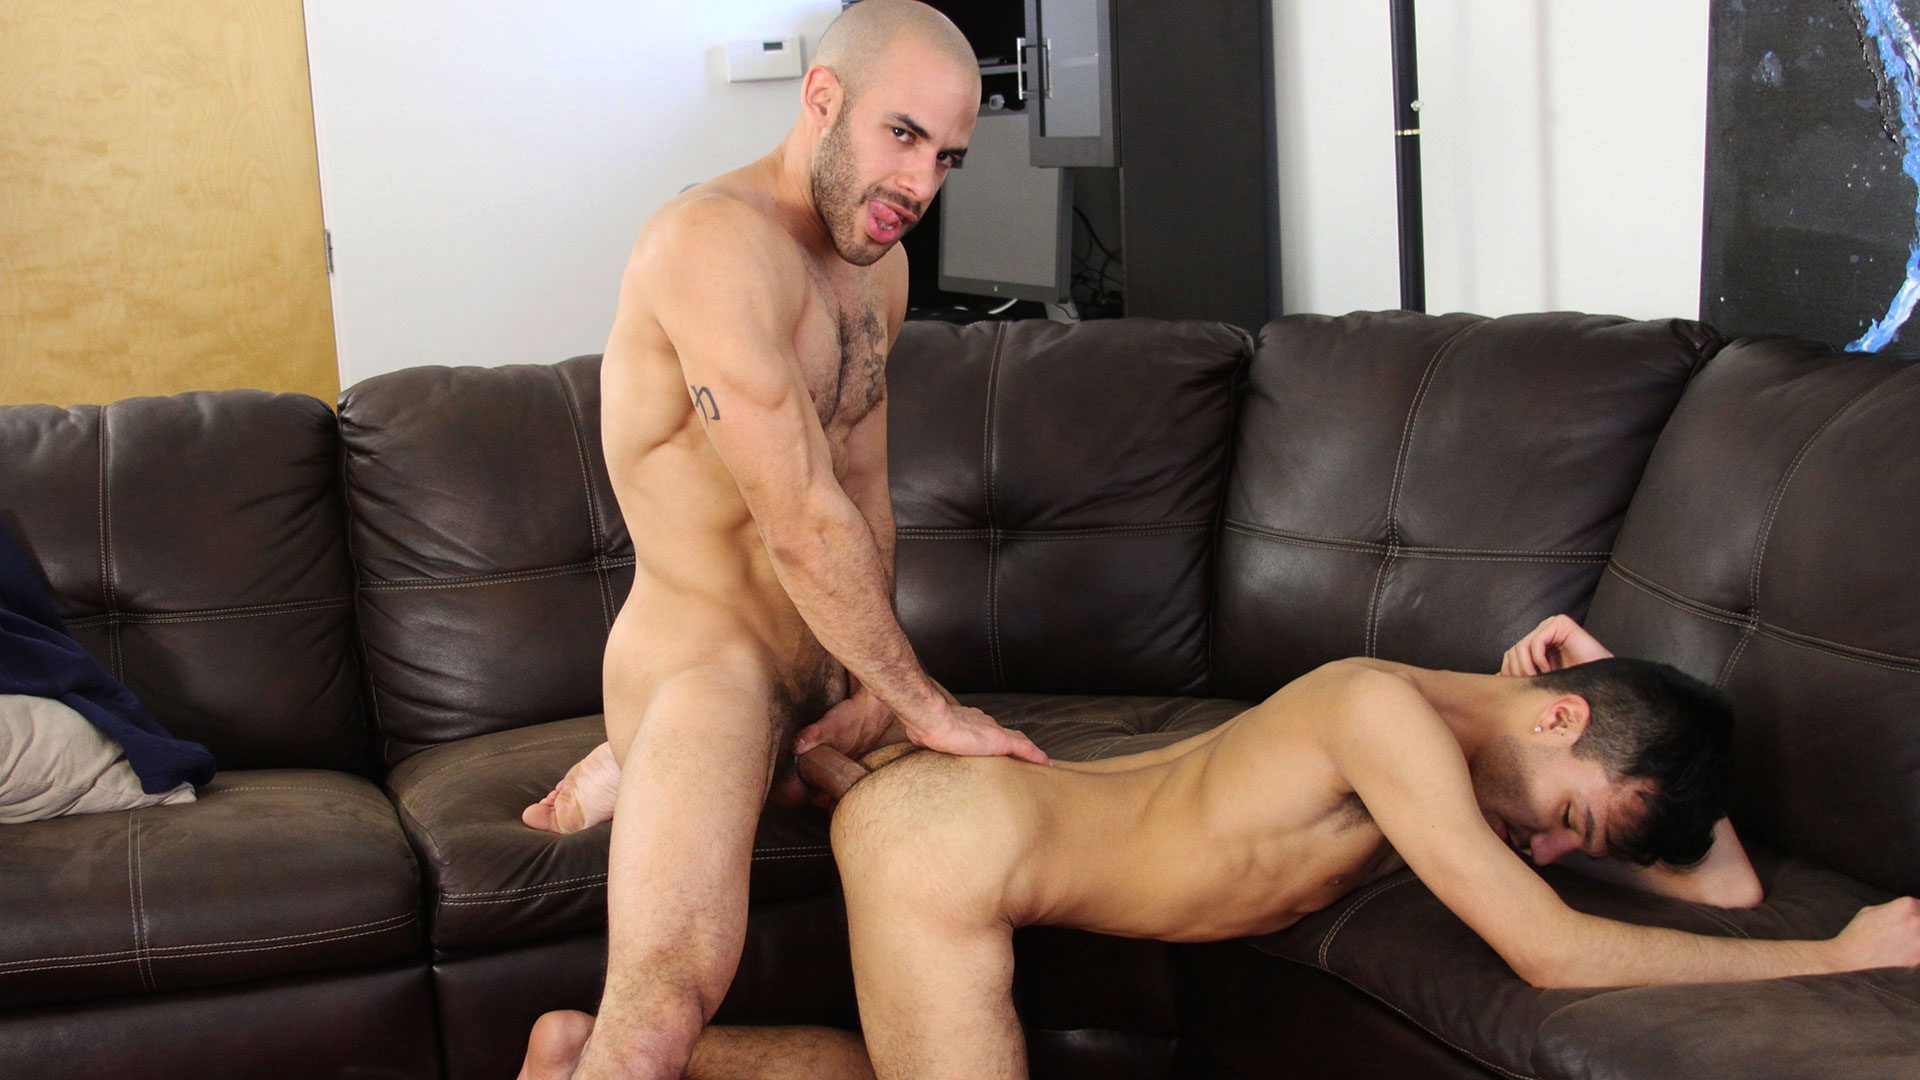 Austin Wilde Porno Gay guys in sweatpants - austin wilde & jacob rivera   gay porn